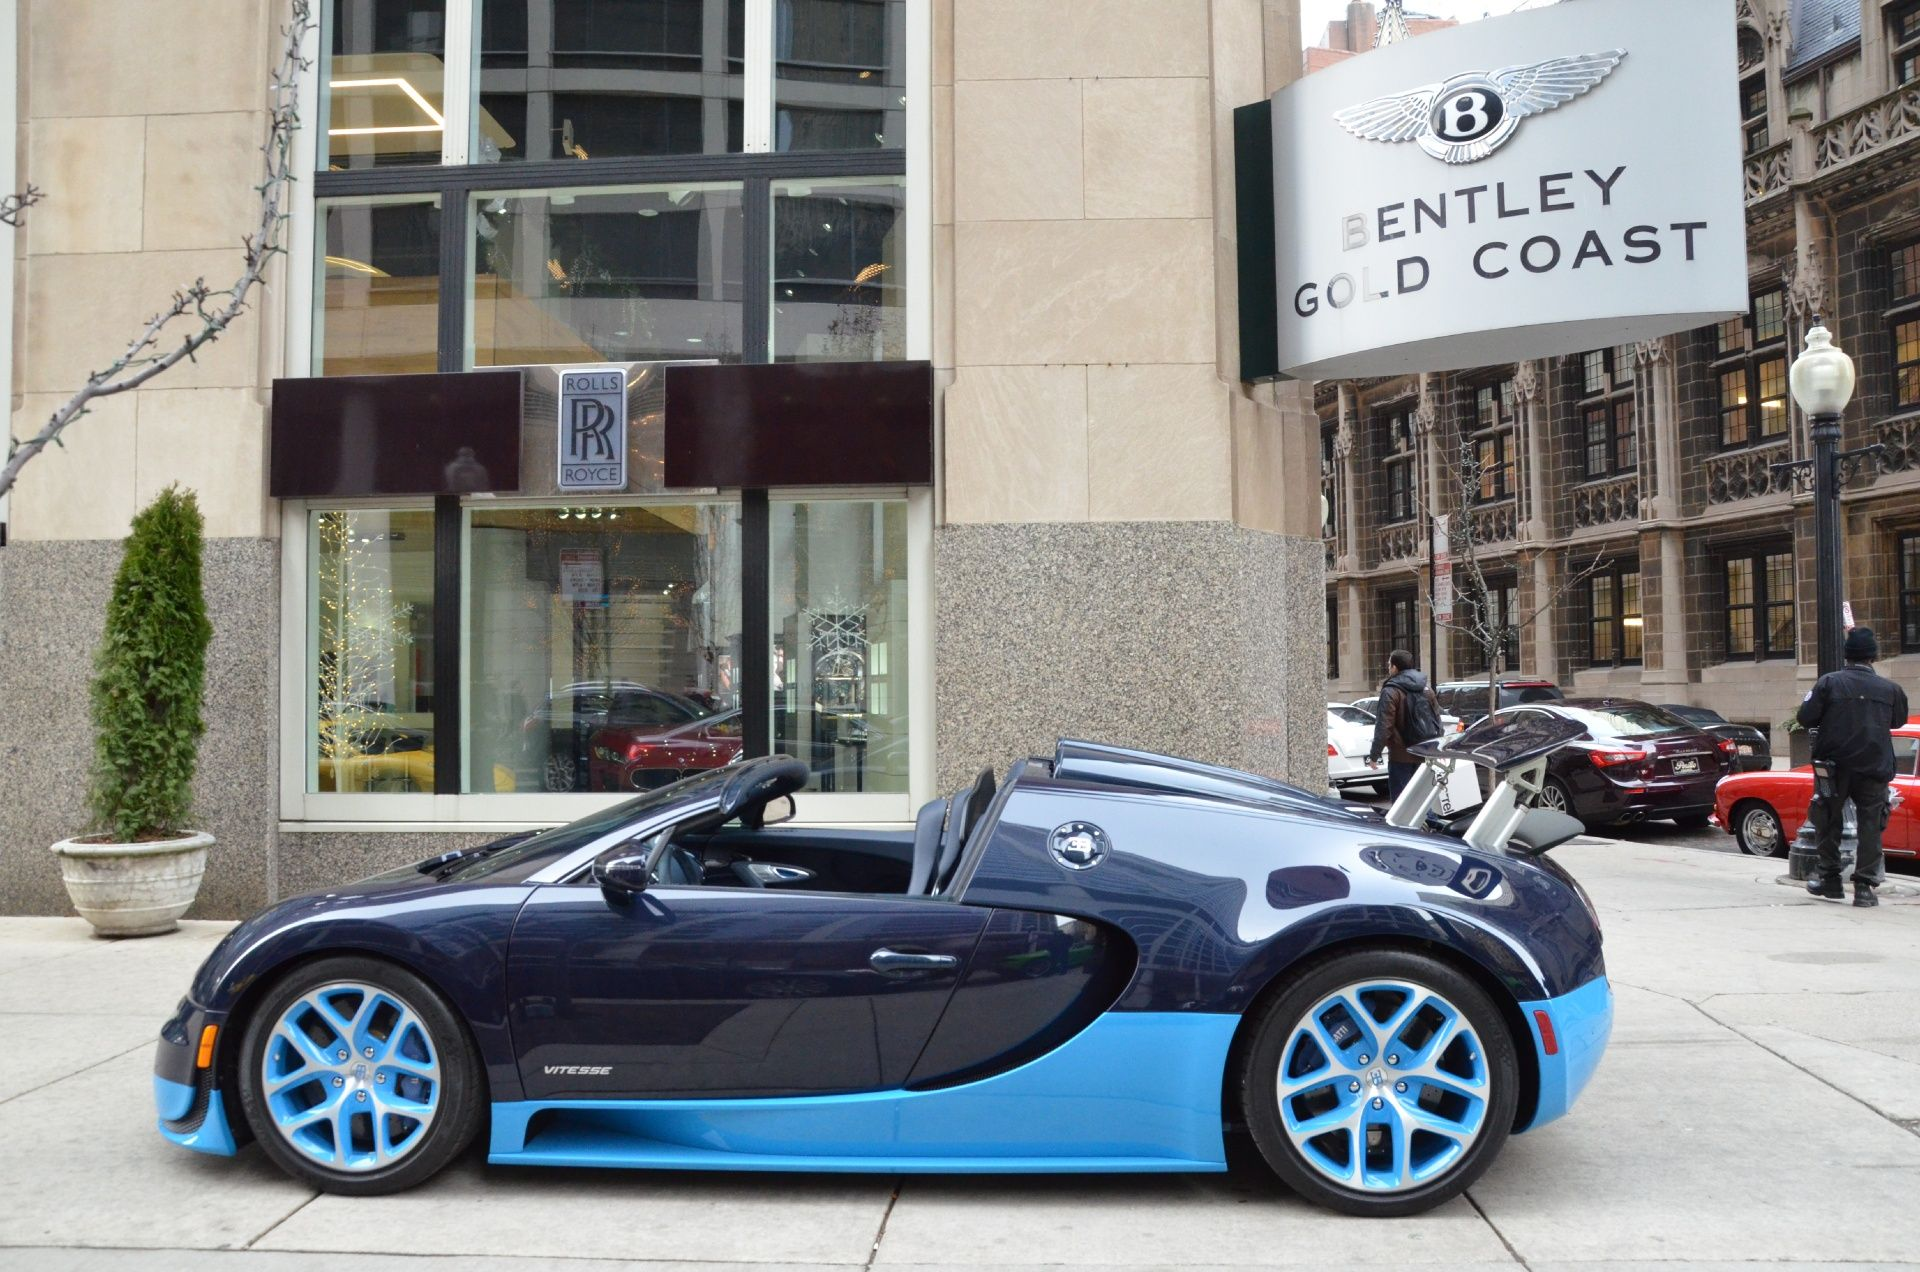 2014 Bugatti Veyron Vitesse in blue on blue is beautiful.